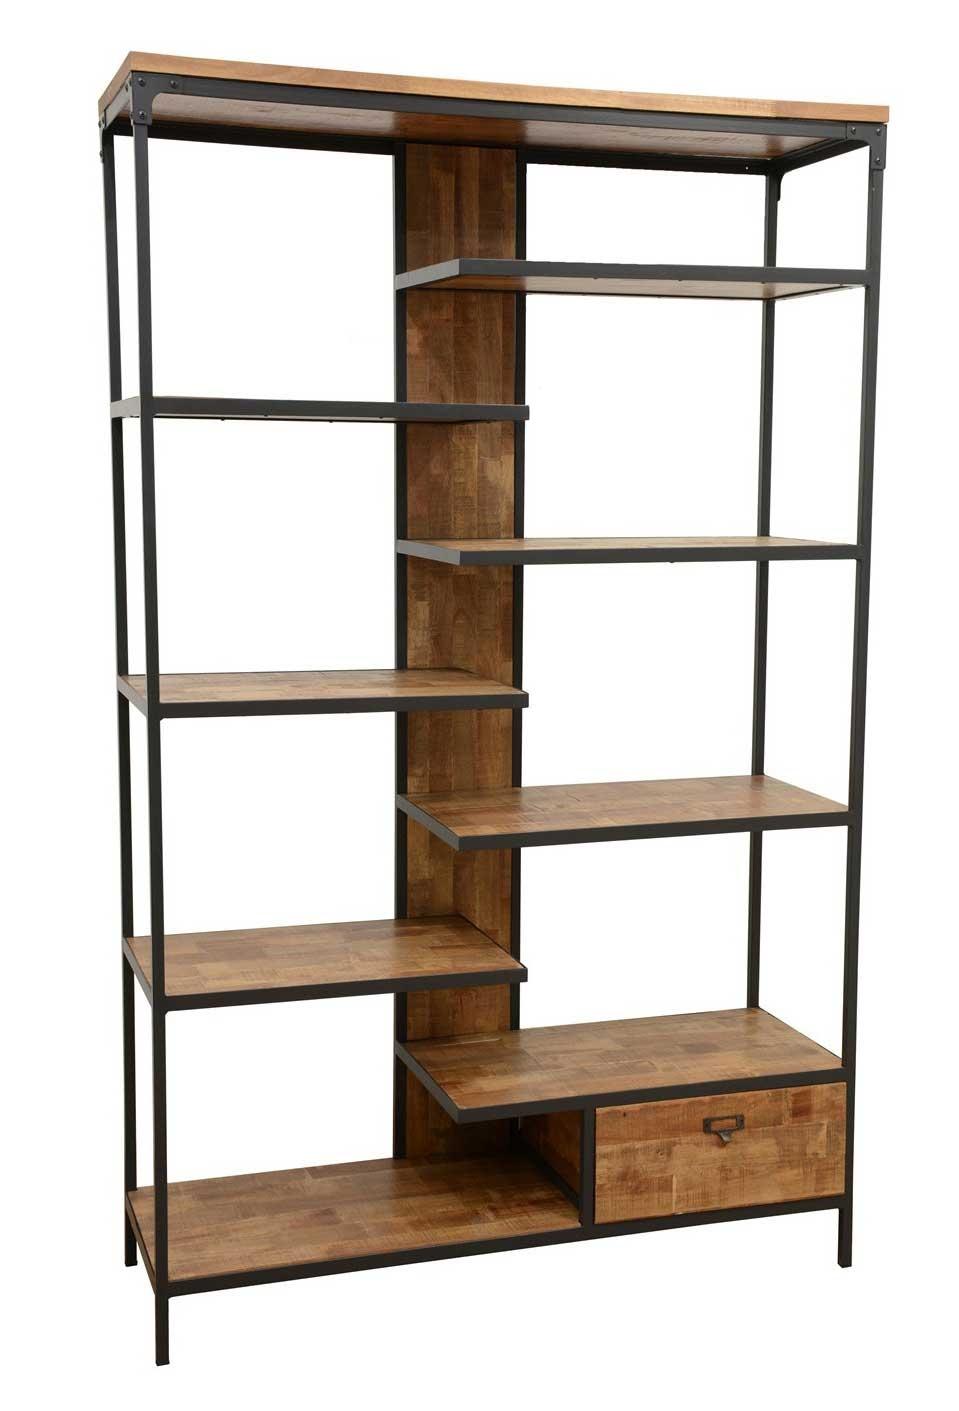 indus tag re industrielle bois et m tal. Black Bedroom Furniture Sets. Home Design Ideas